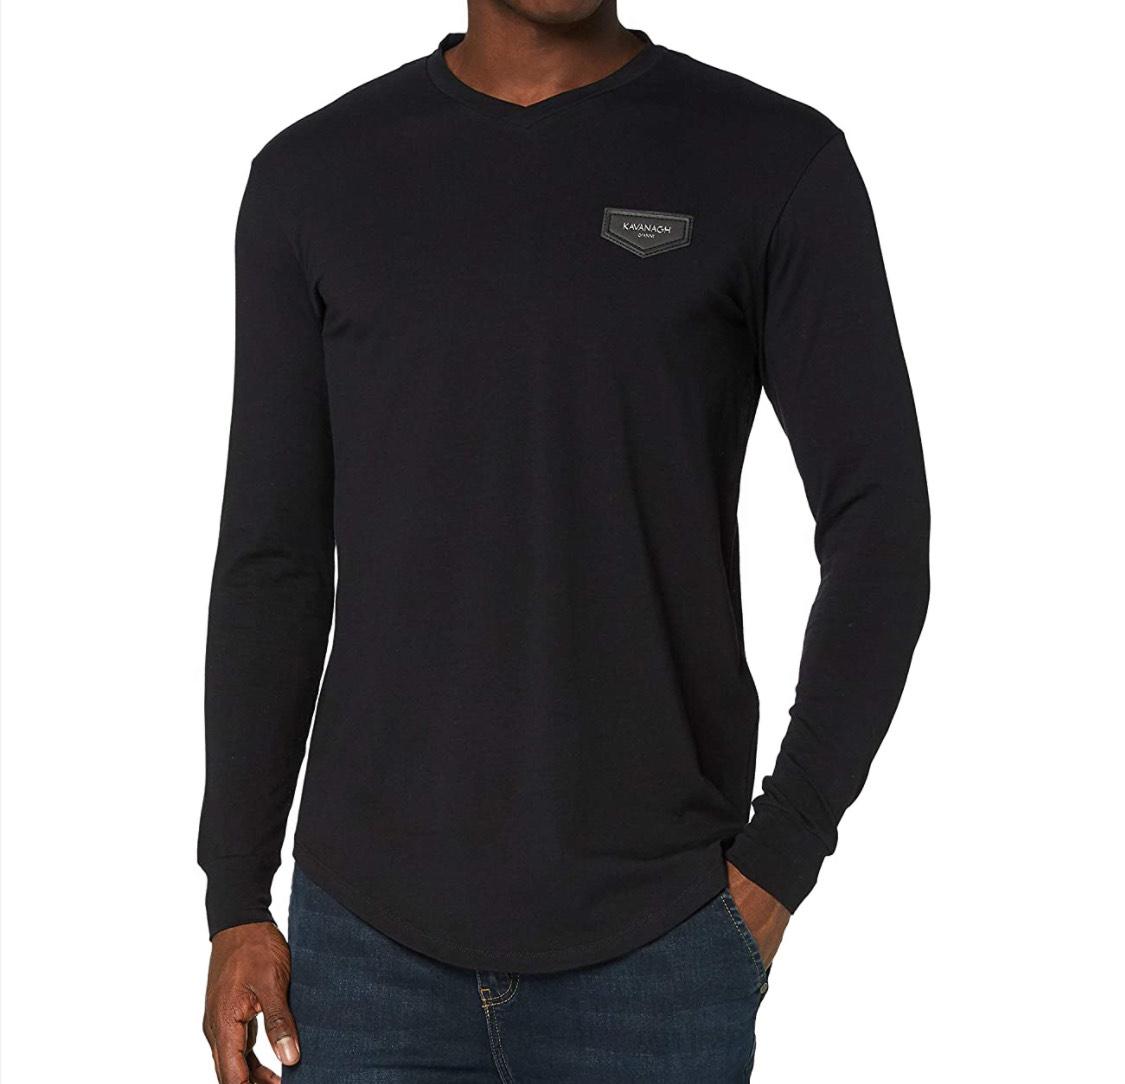 Camiseta Gianni Kavanagh hombre talla M.